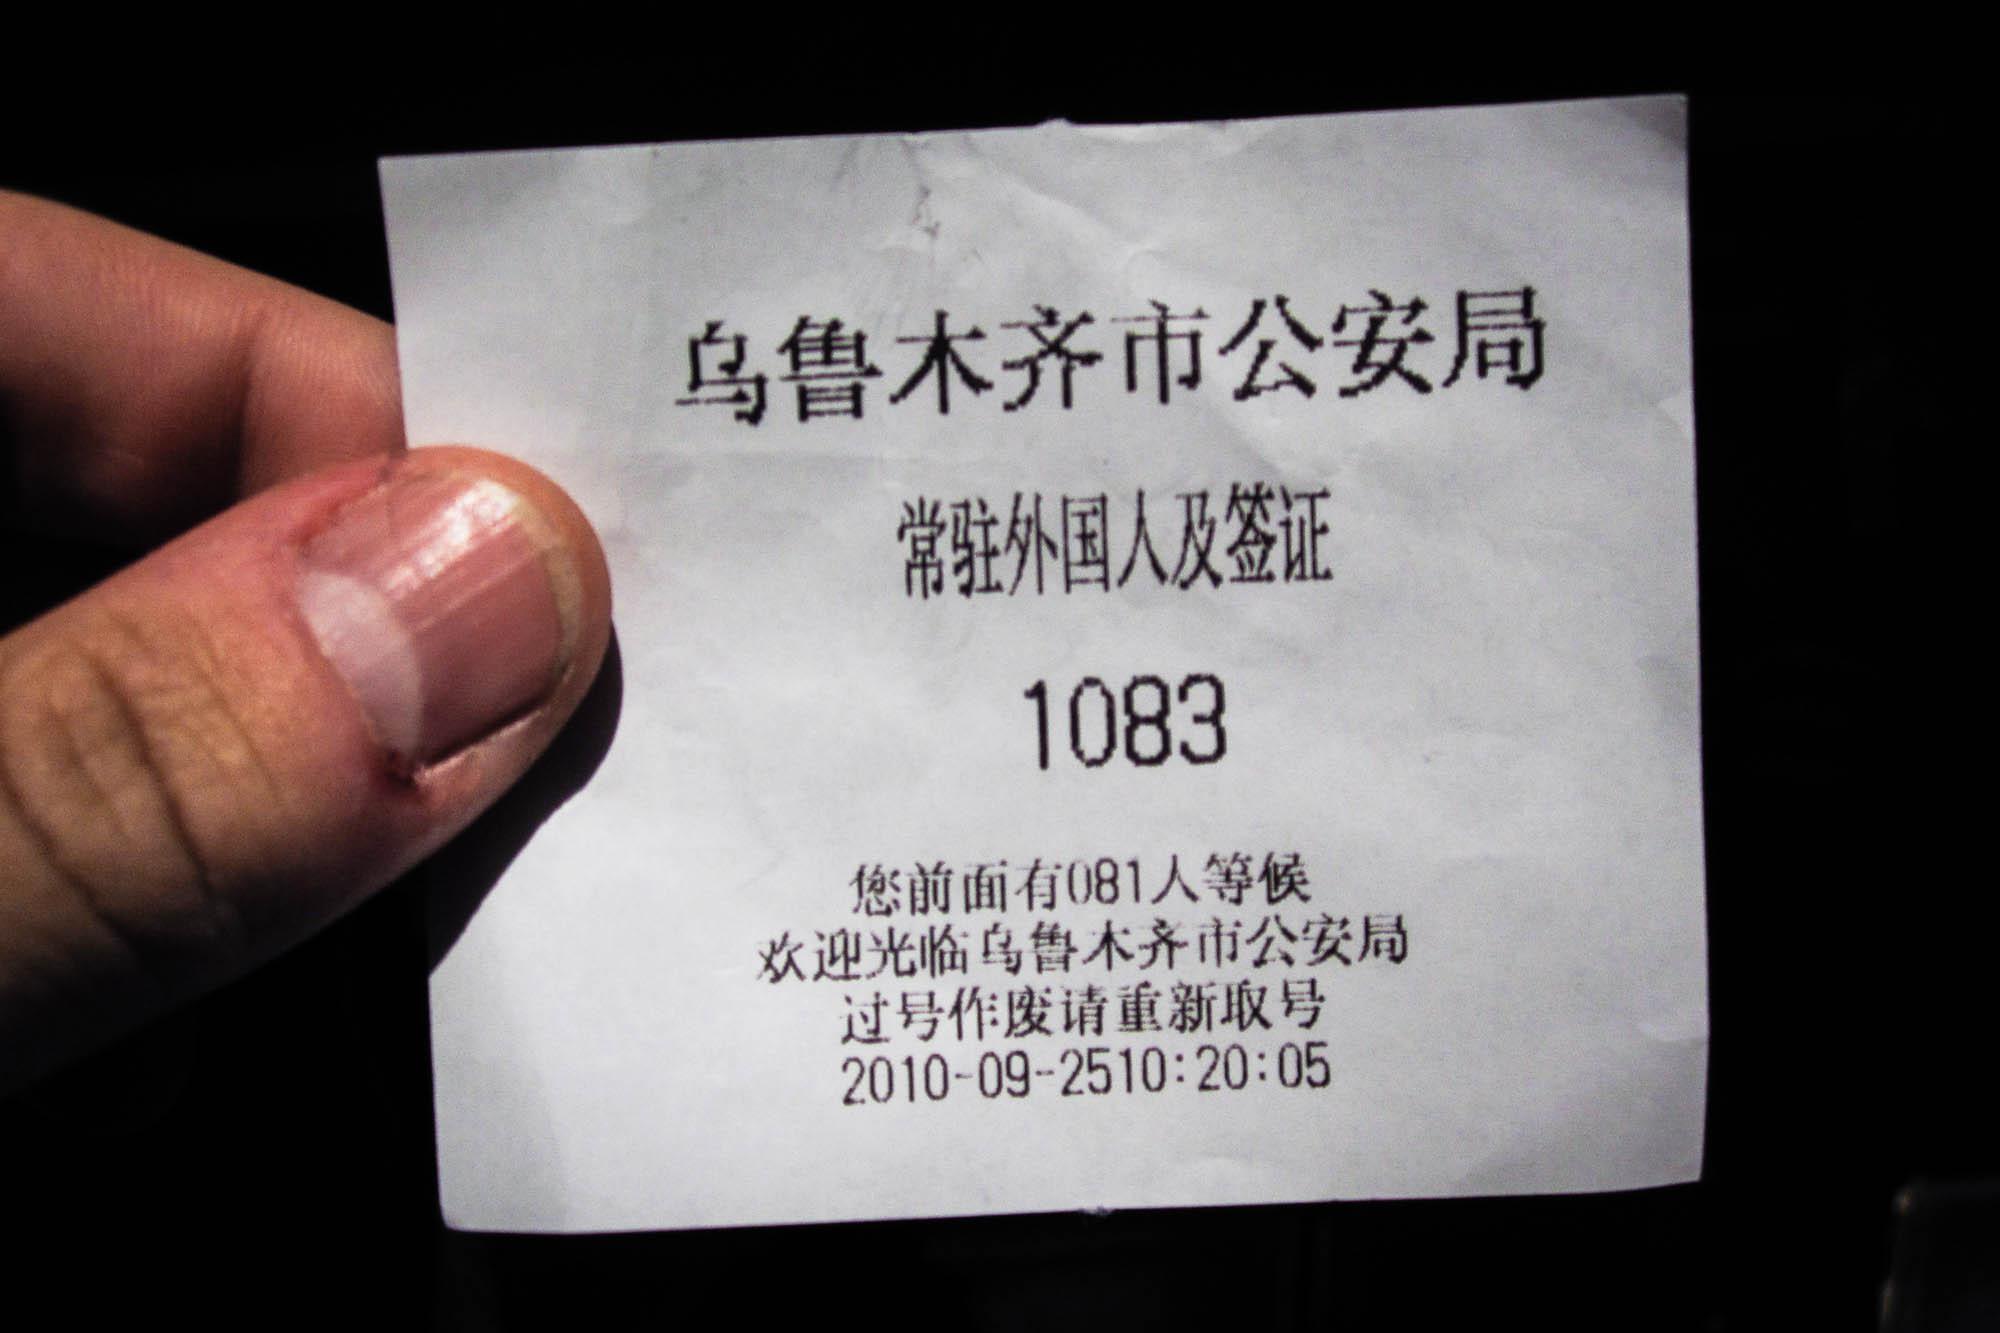 number 1083